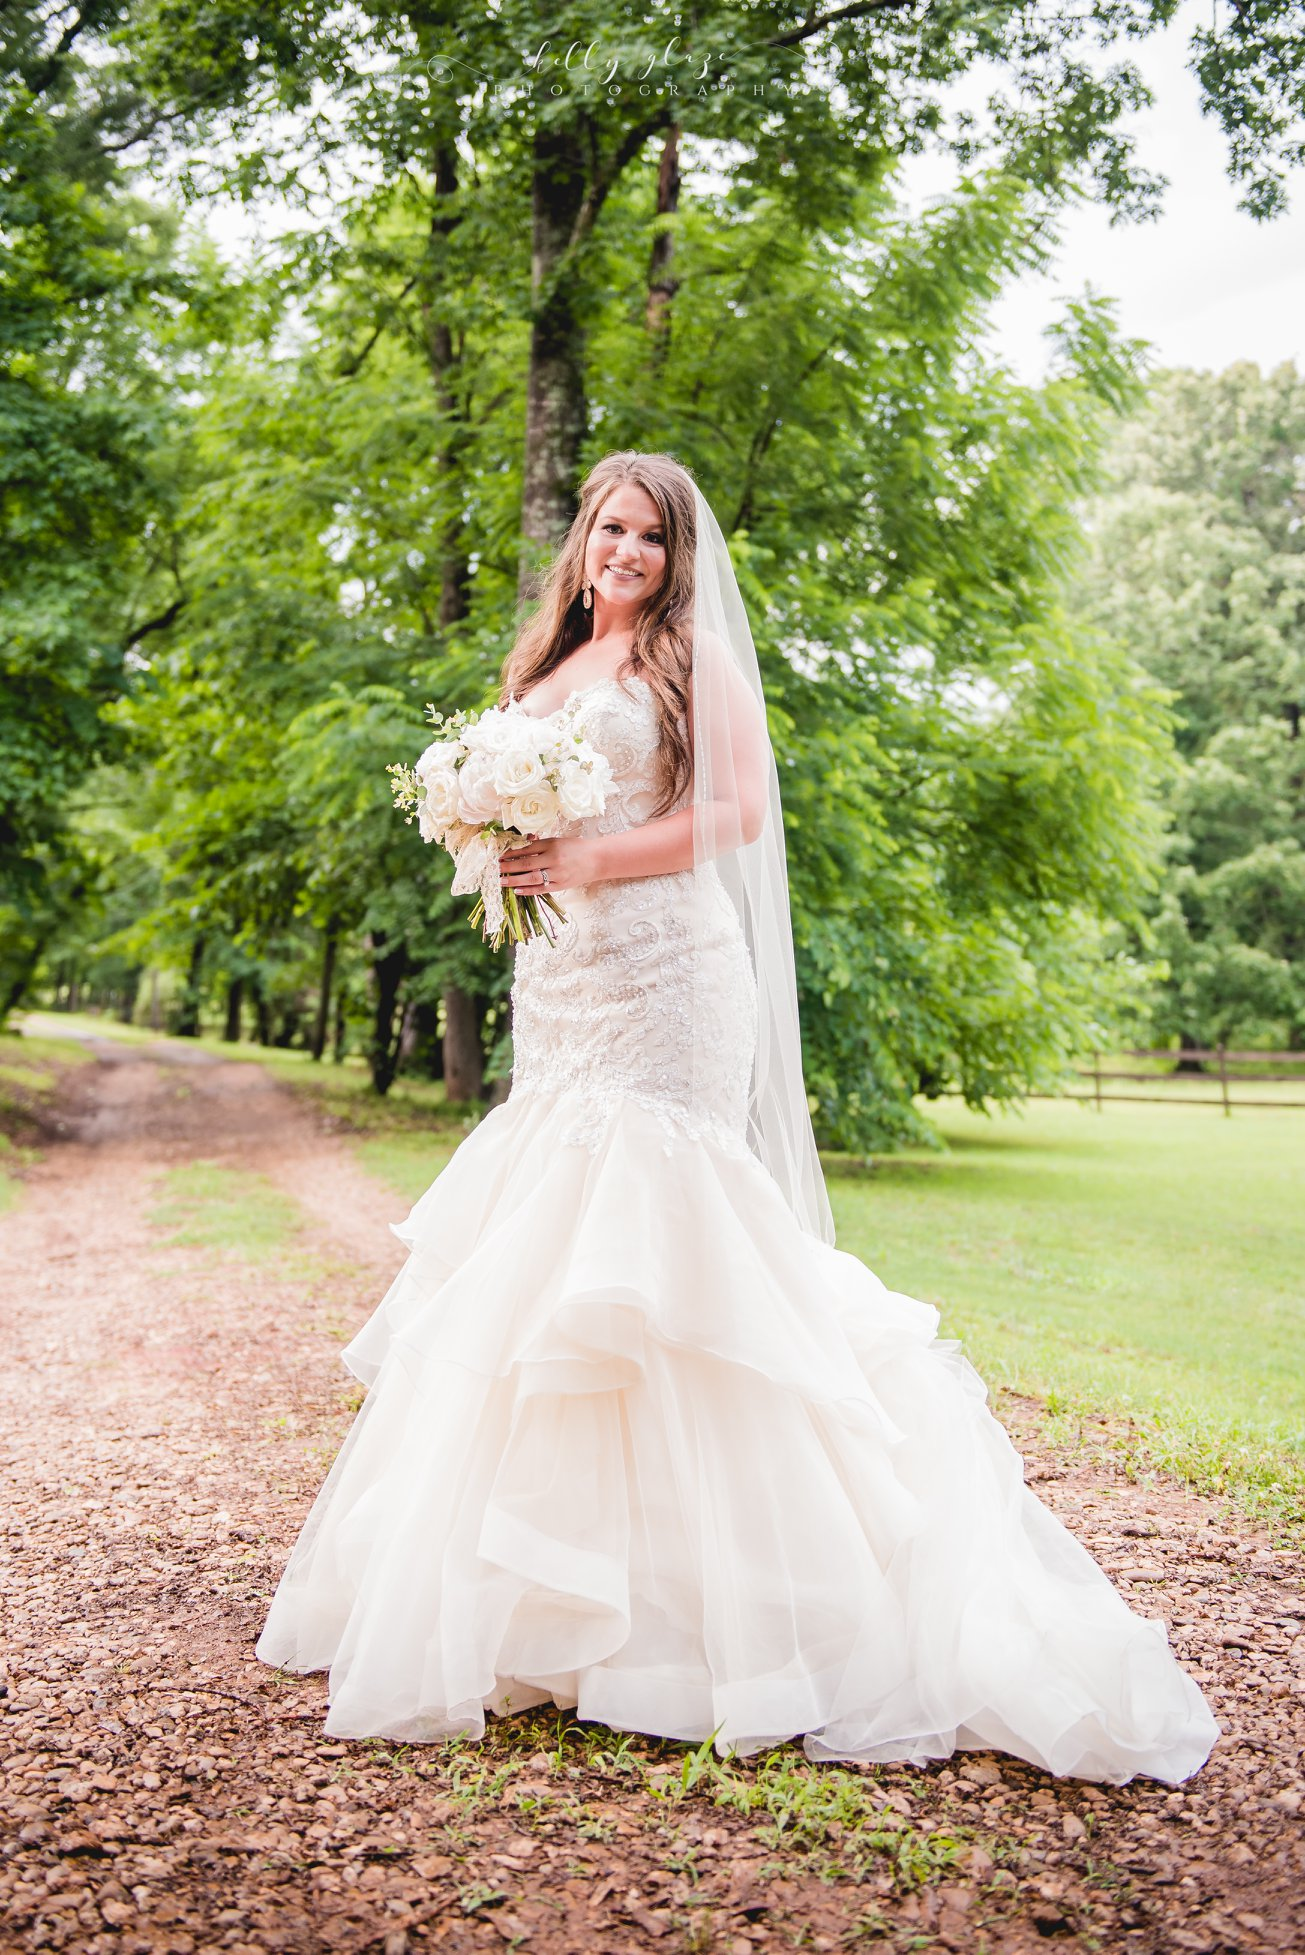 Kelly Glaze Photography , from  Delaney + Cy 's wedding